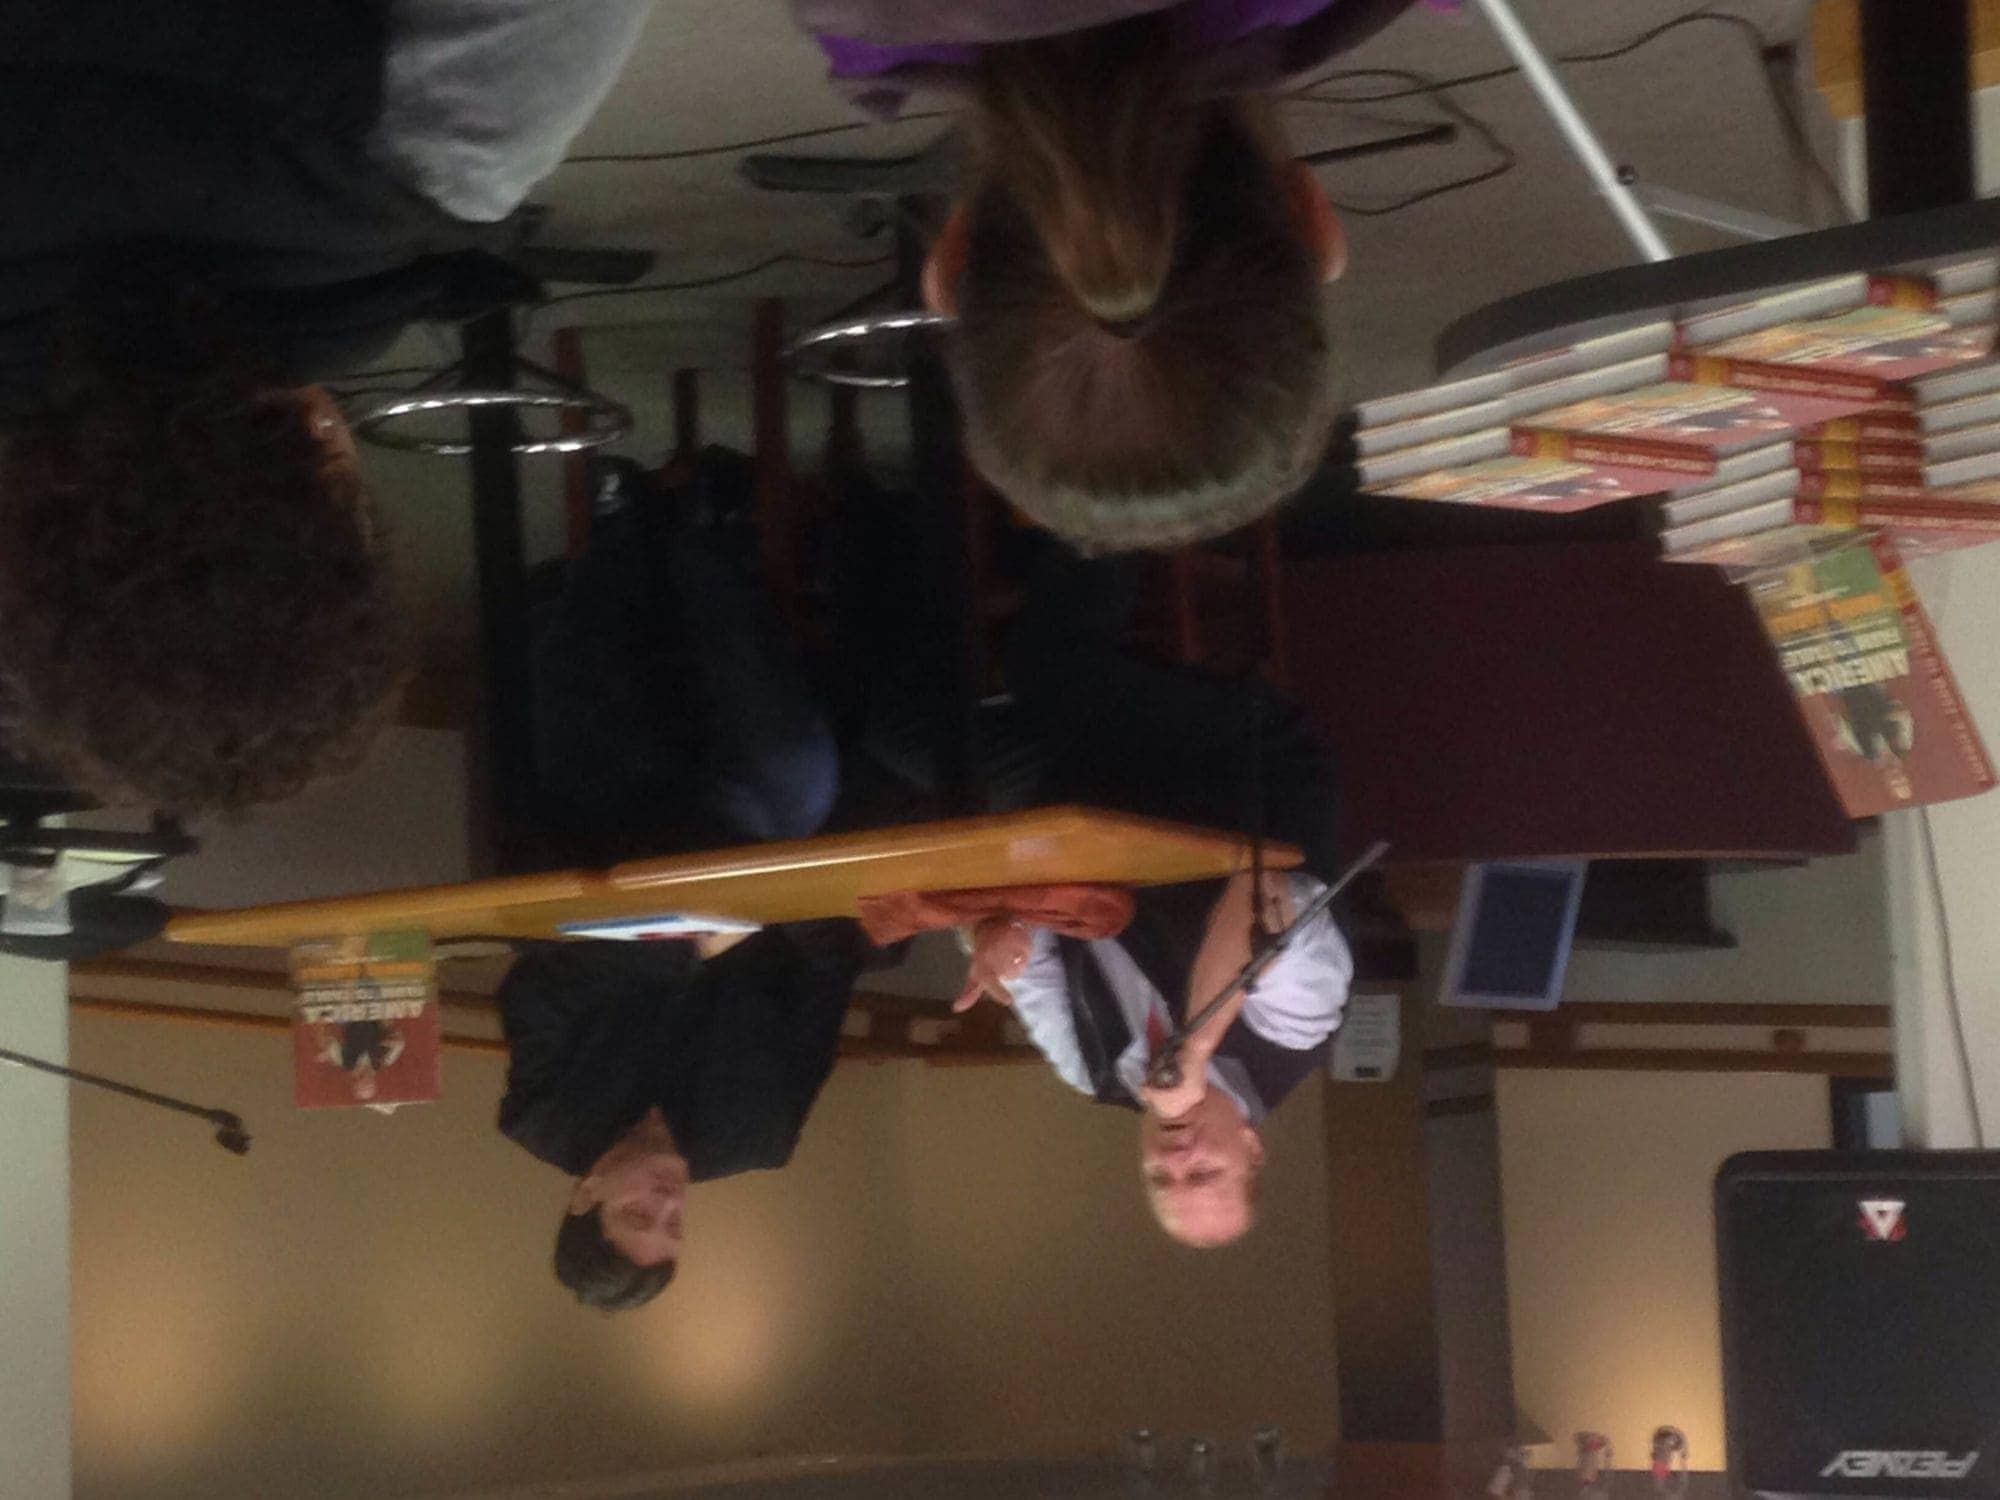 Mario Batali with Rick Coates at Horizon Books, Traverse City